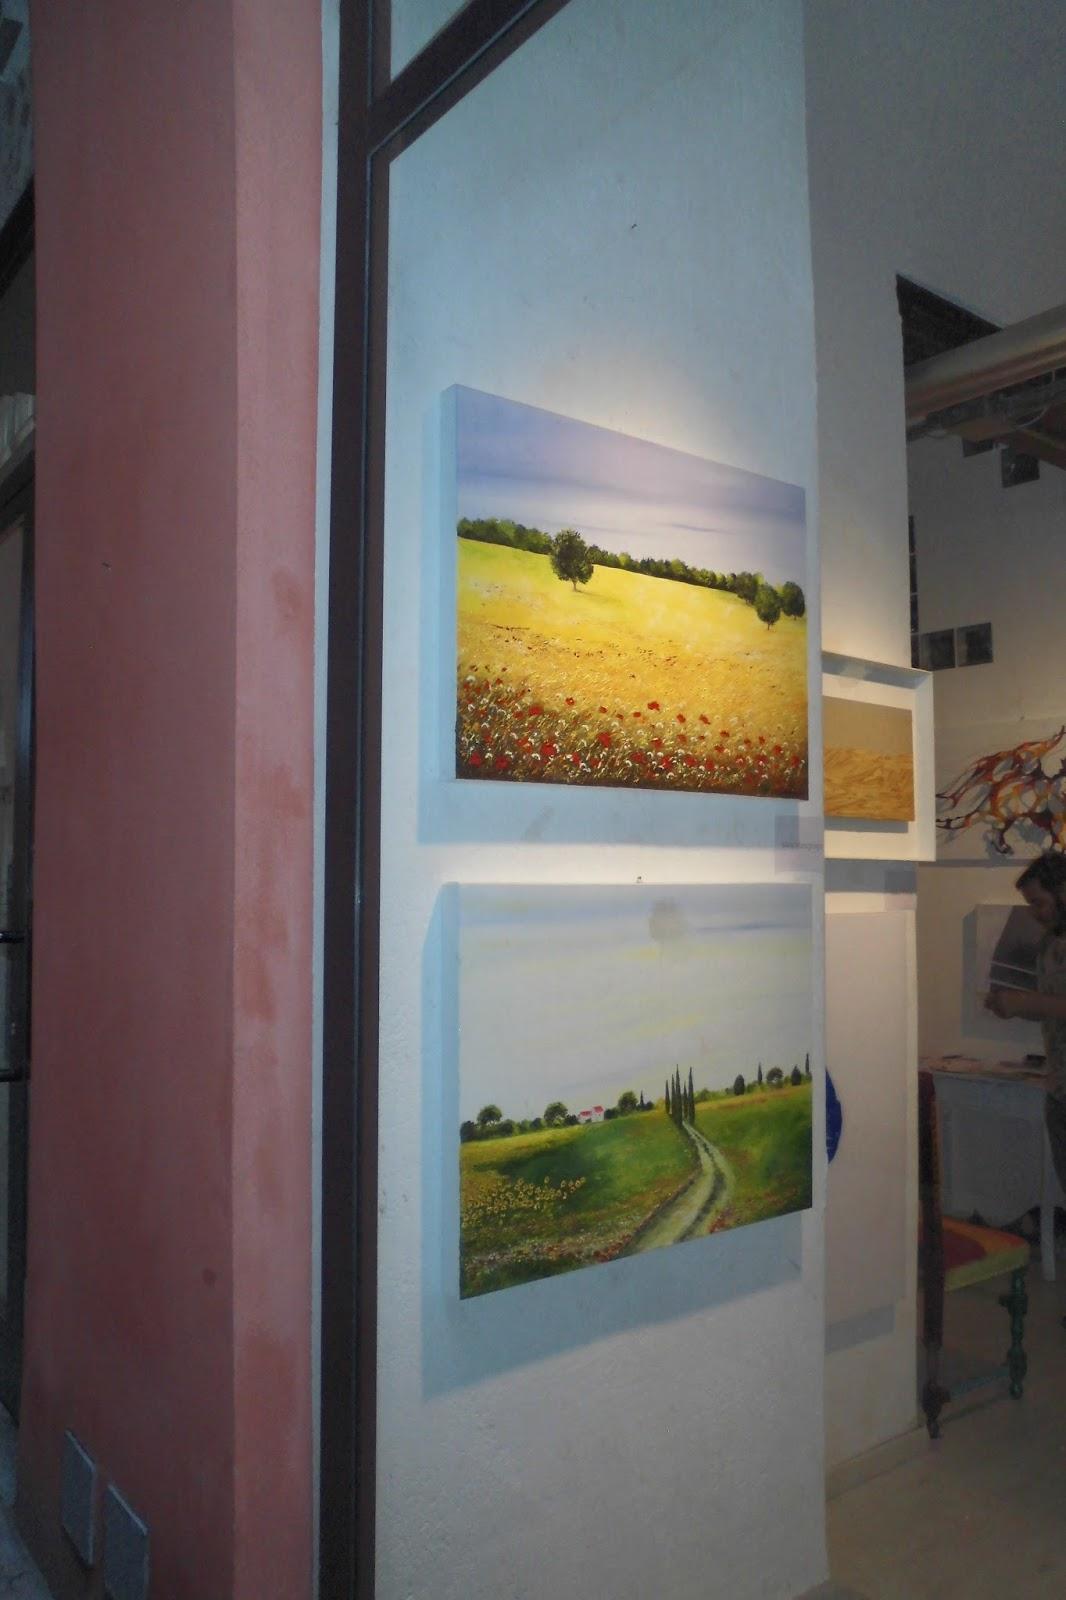 Merlino Bottega D Arte silvia martignago: foto vernissage firenze - galleria